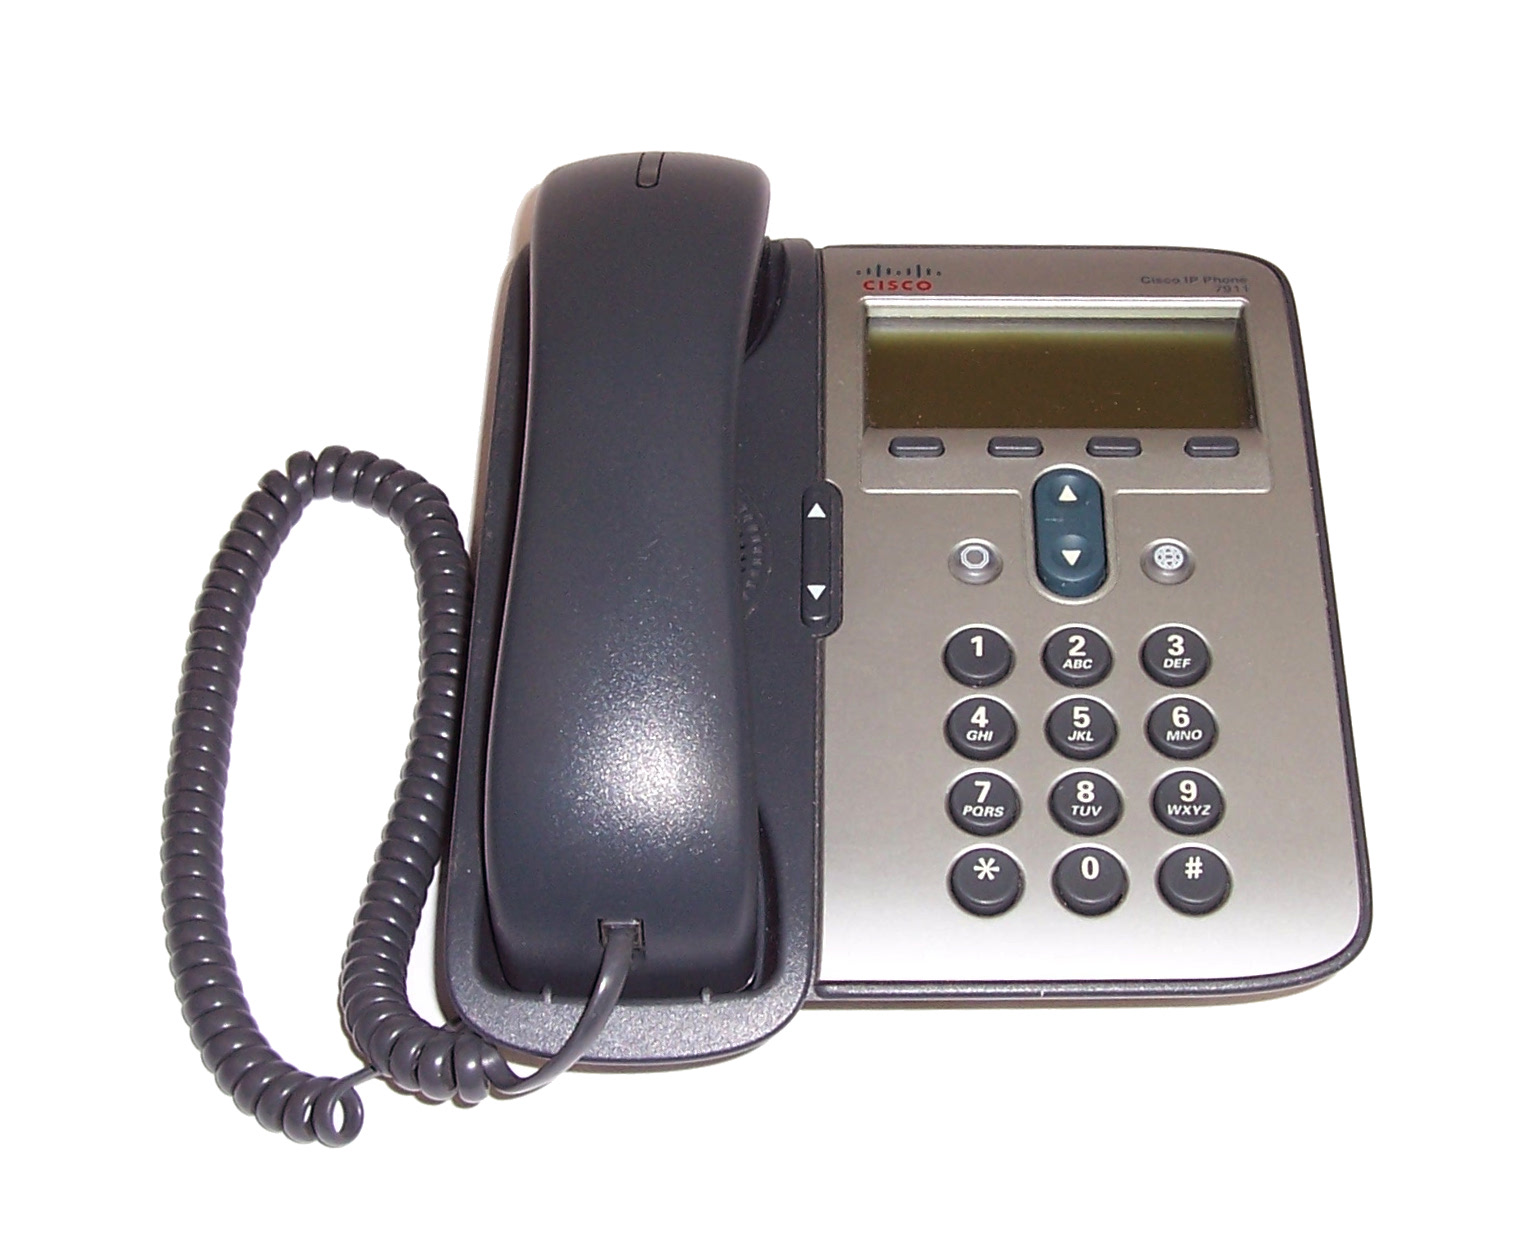 7911 Cisco phone Manual